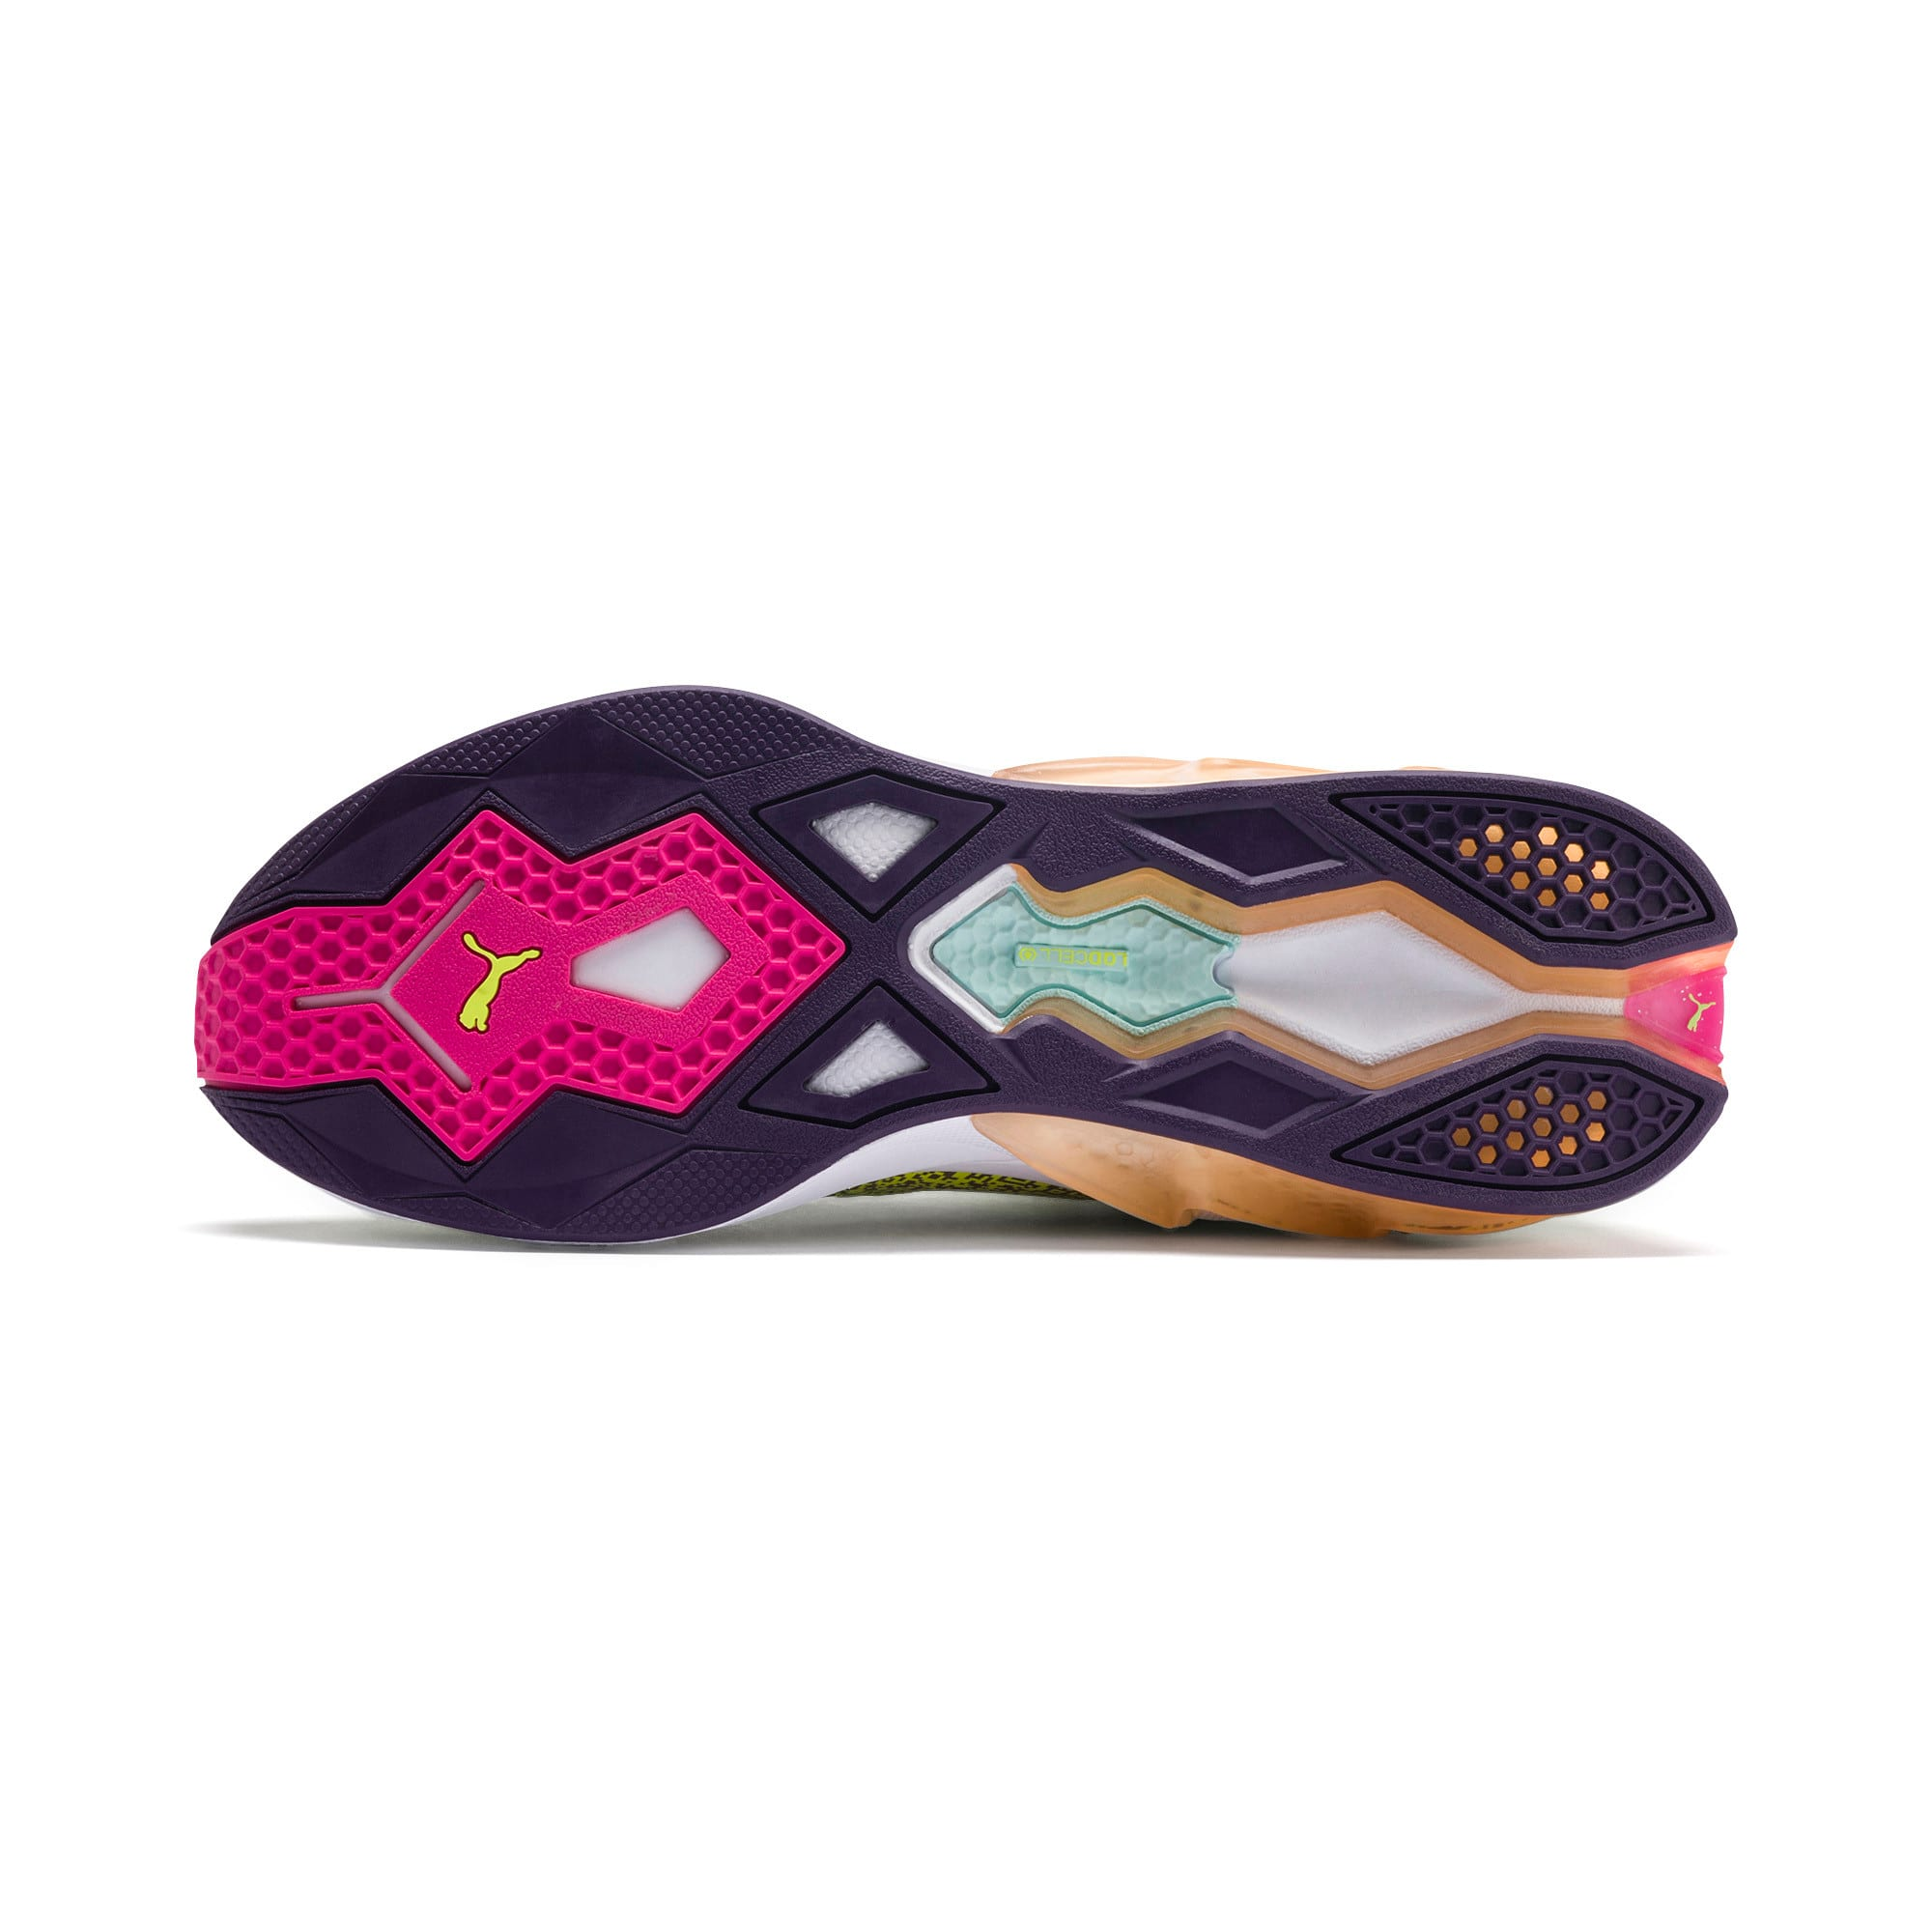 Thumbnail 4 of LQDCELL Origin AR Men's Training Shoes, Fizzy Yllow-Indigo-Ornge Pop, medium